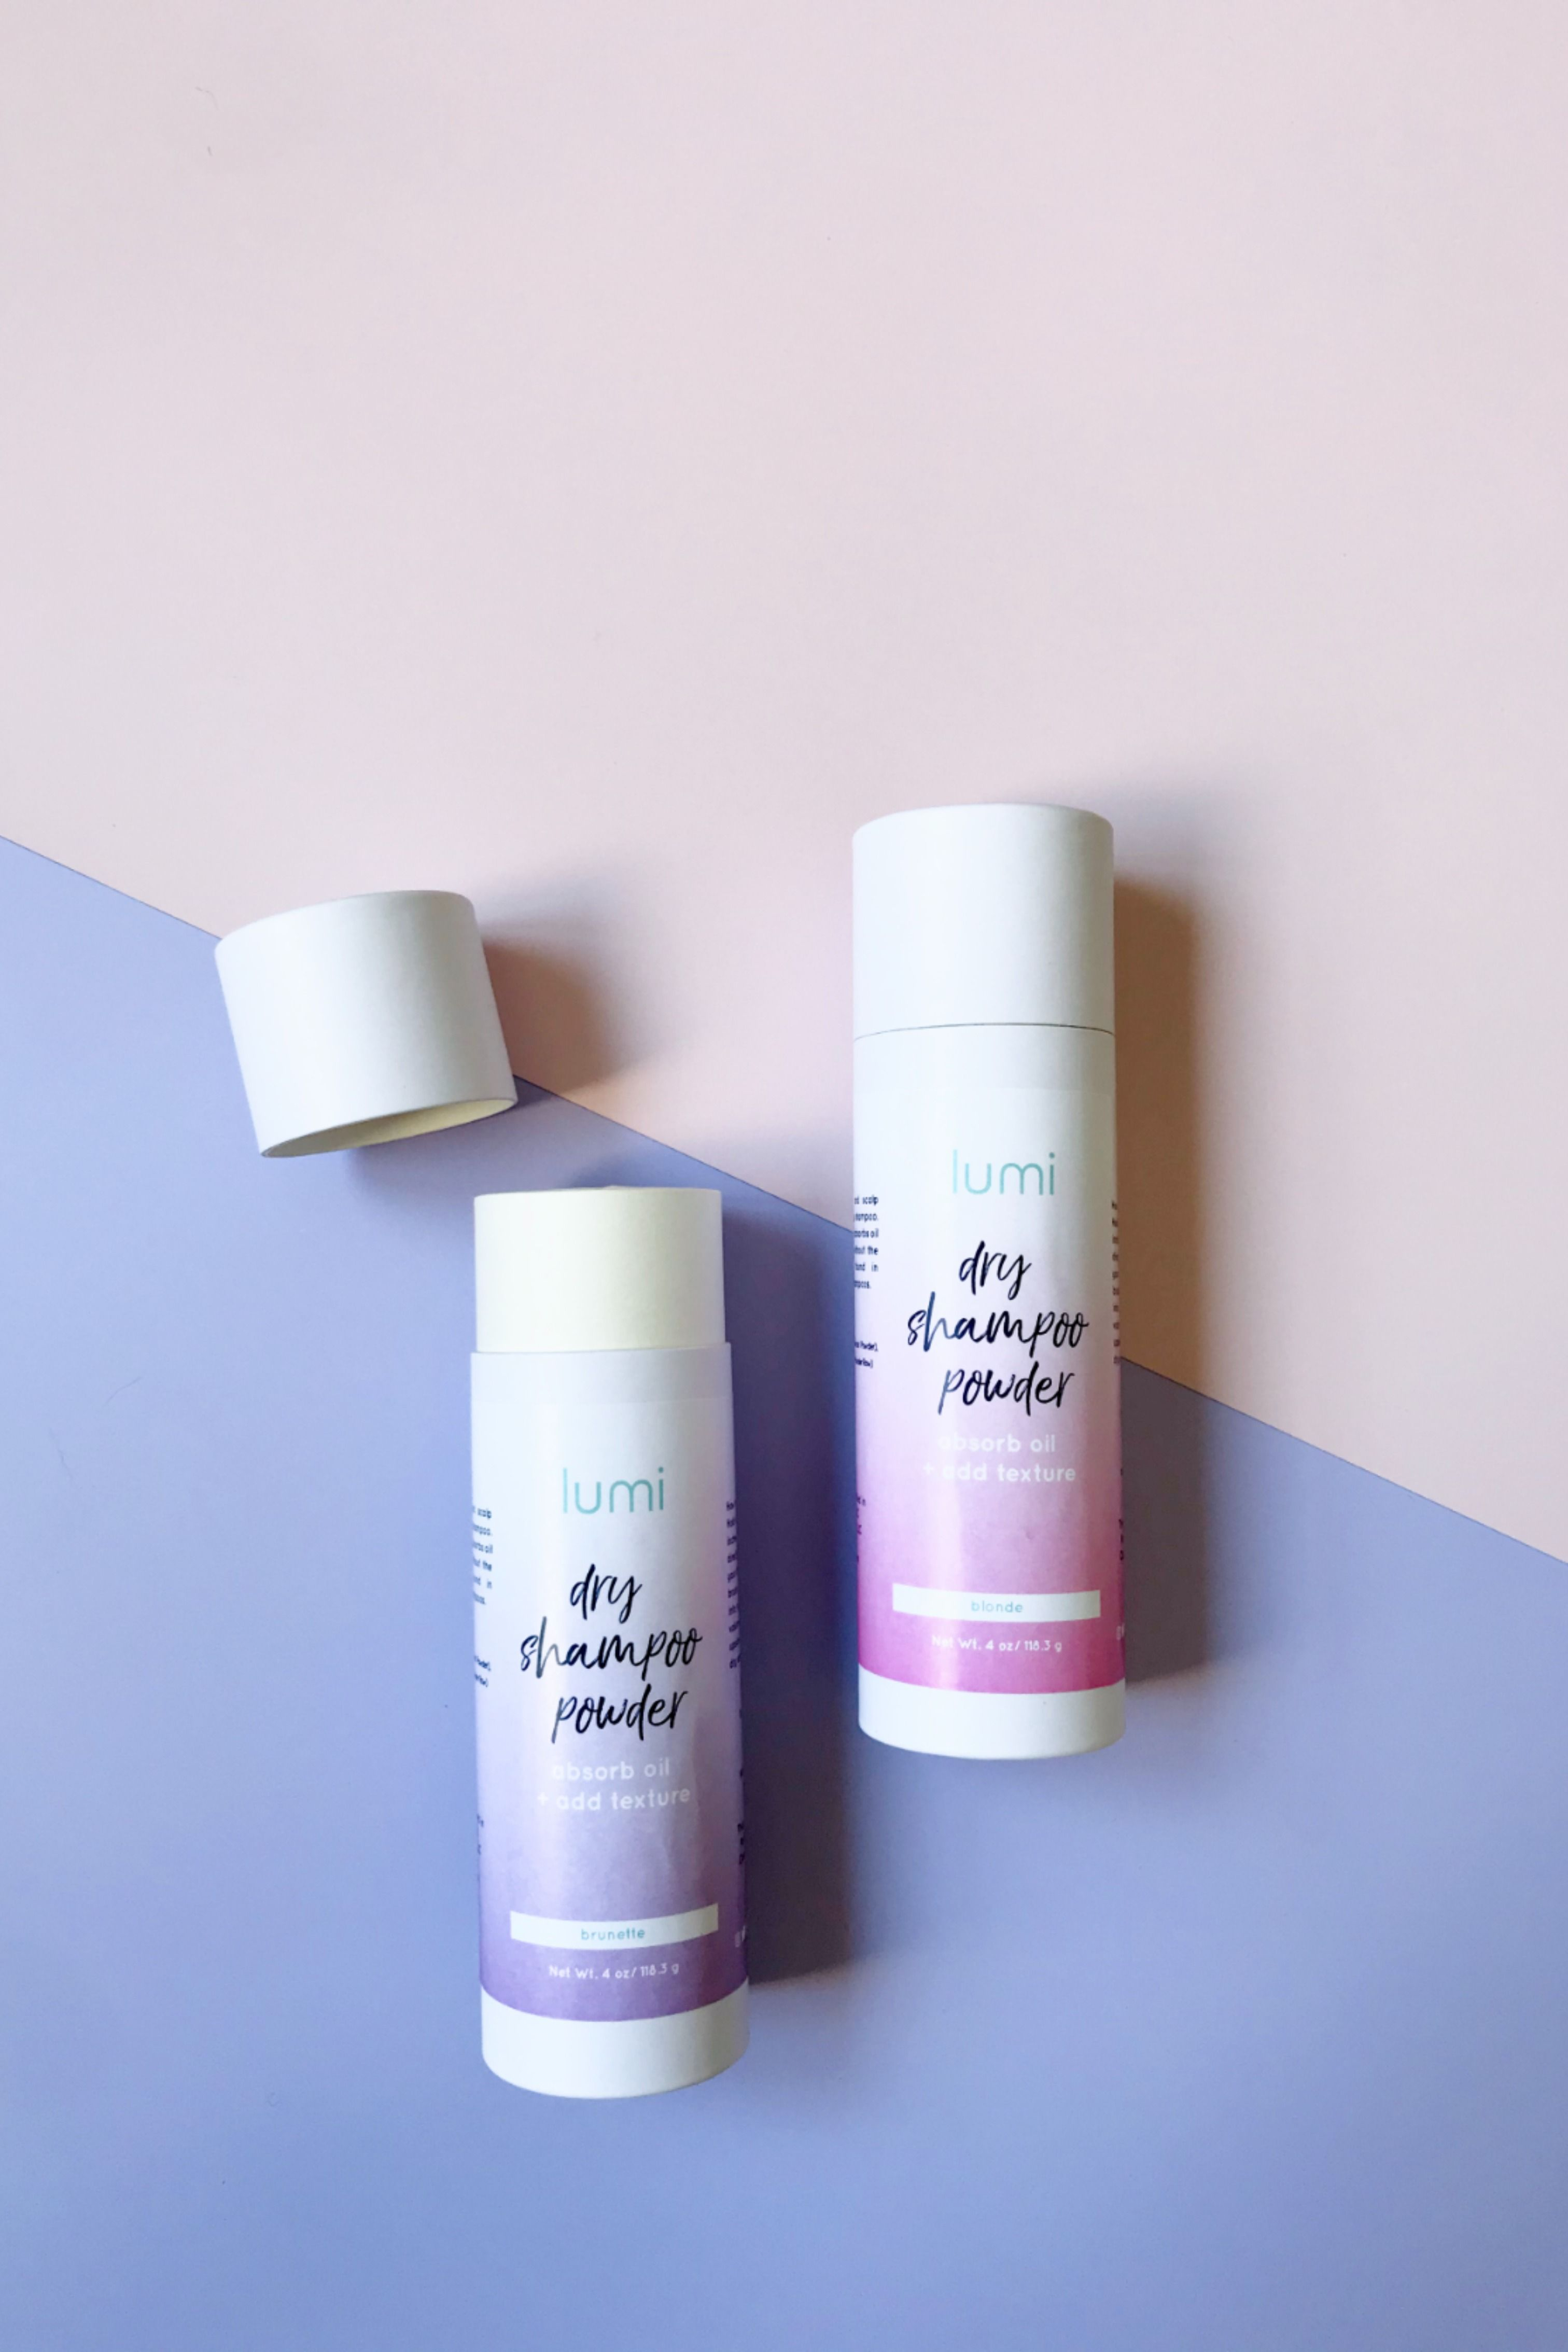 Dry Shampoo Powder Dry Shampoo Powder Shampoo Powder Dry Shampoo